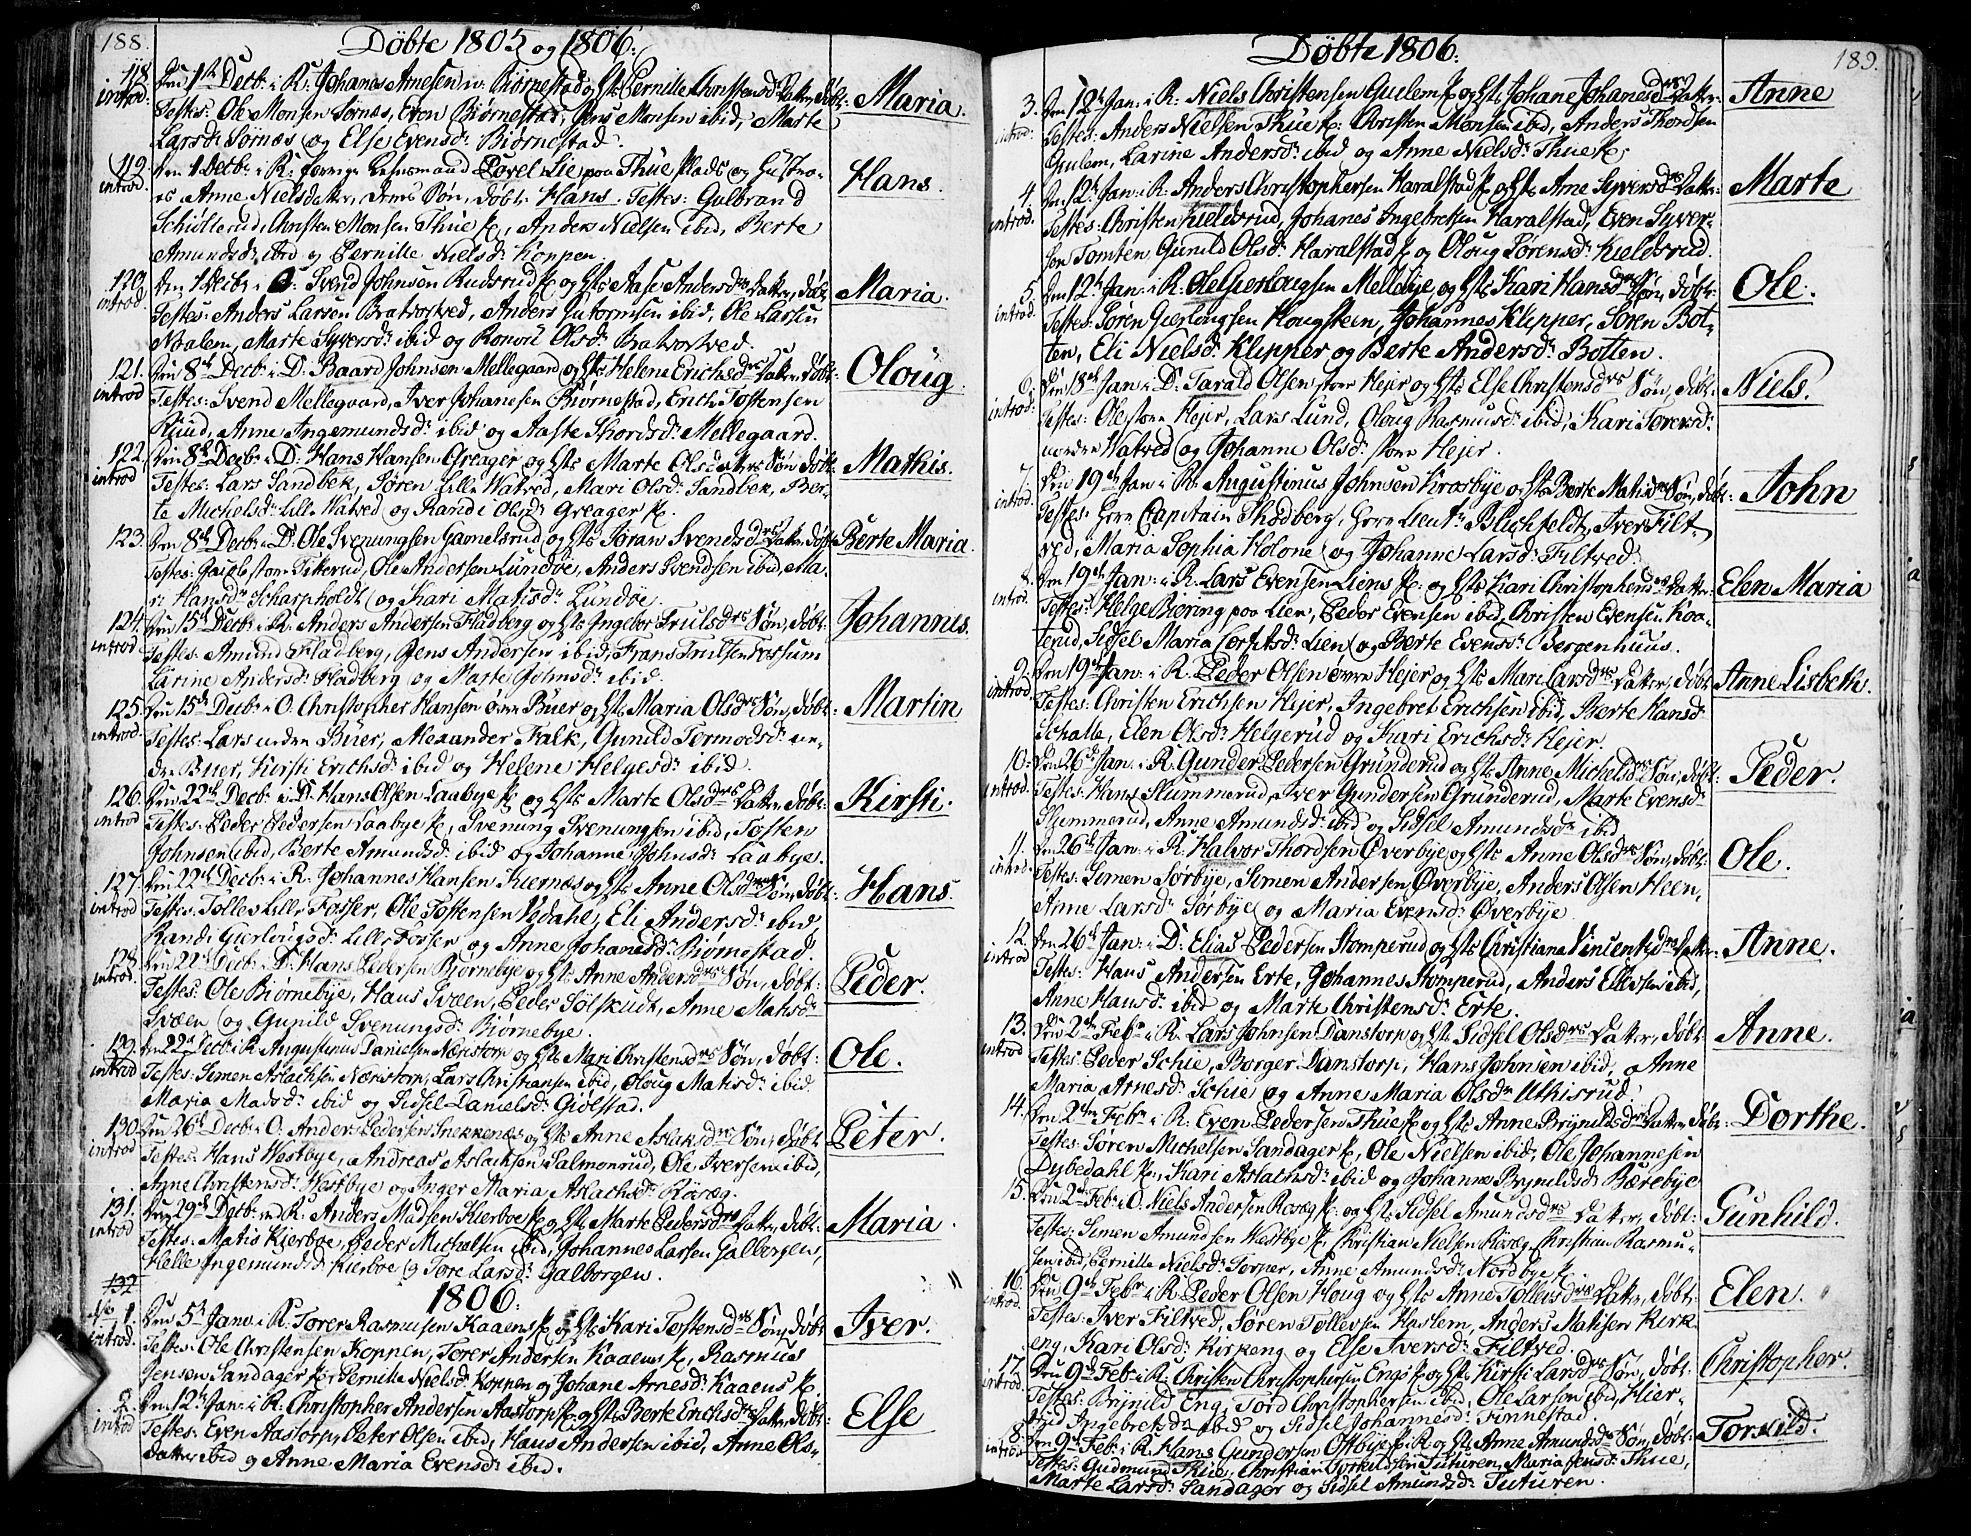 SAO, Rakkestad prestekontor Kirkebøker, F/Fa/L0005: Ministerialbok nr. I 5, 1784-1814, s. 188-189